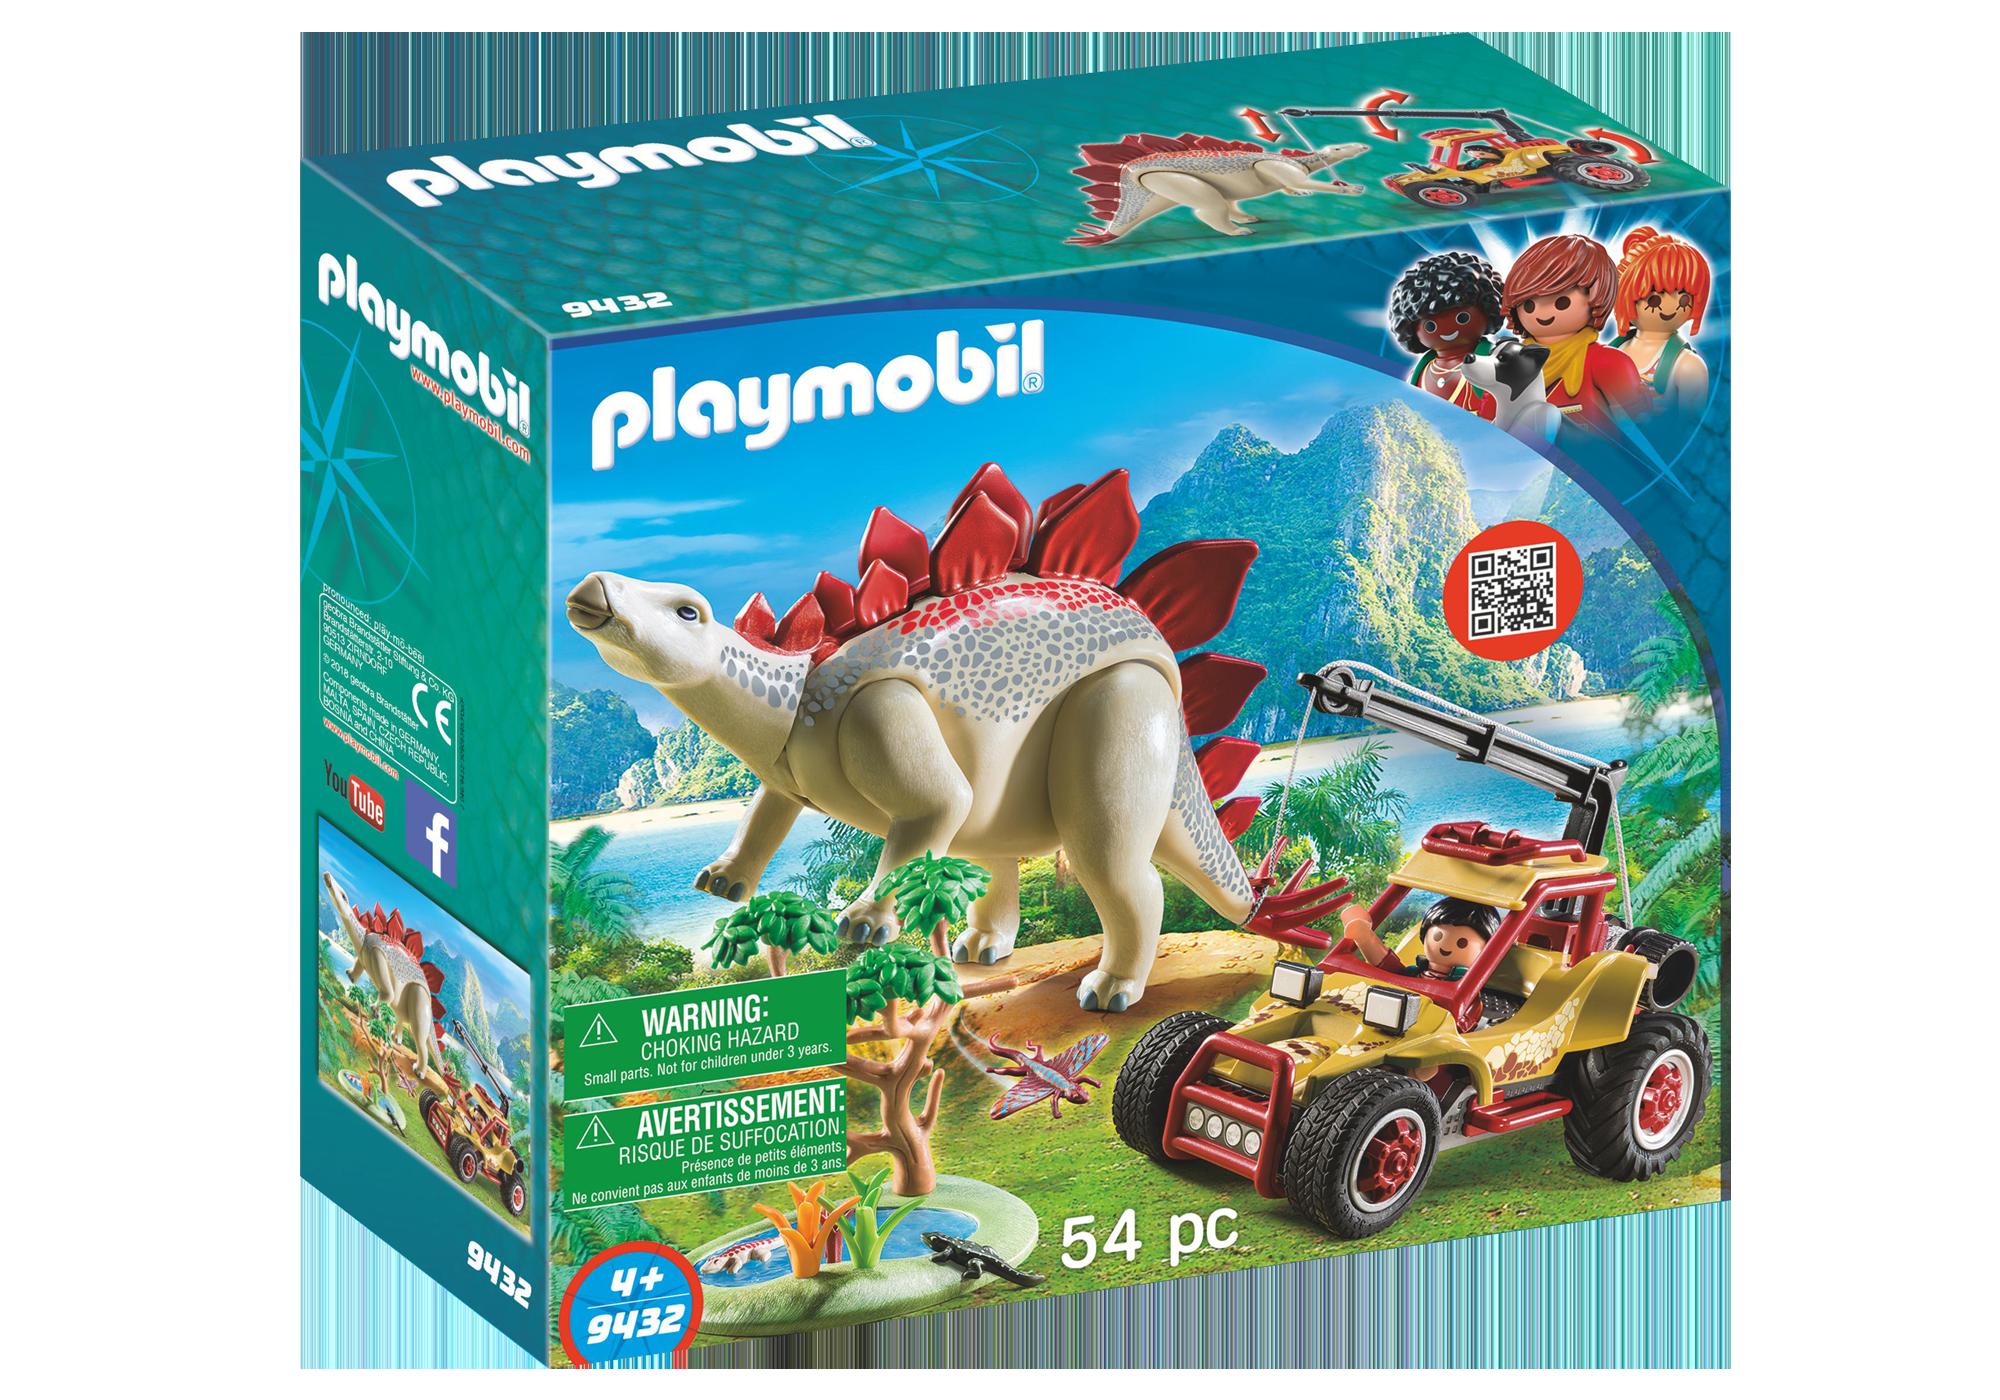 http://media.playmobil.com/i/playmobil/9432_product_box_front/Forschermobil mit Stegosaurus